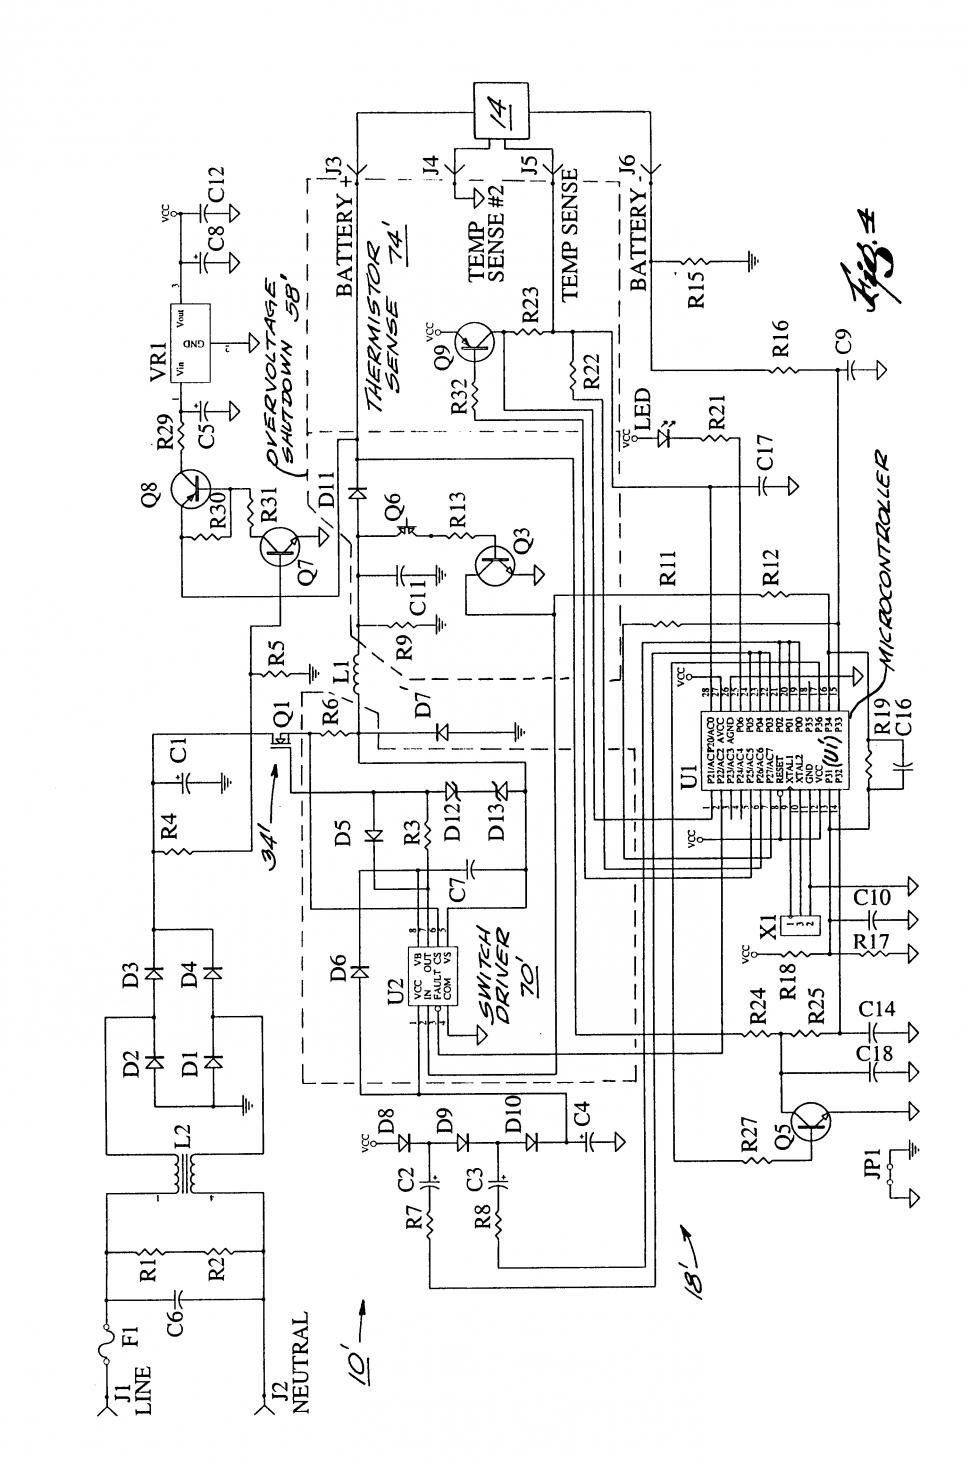 32 Schumacher Battery Charger Se 4020 Wiring Diagram